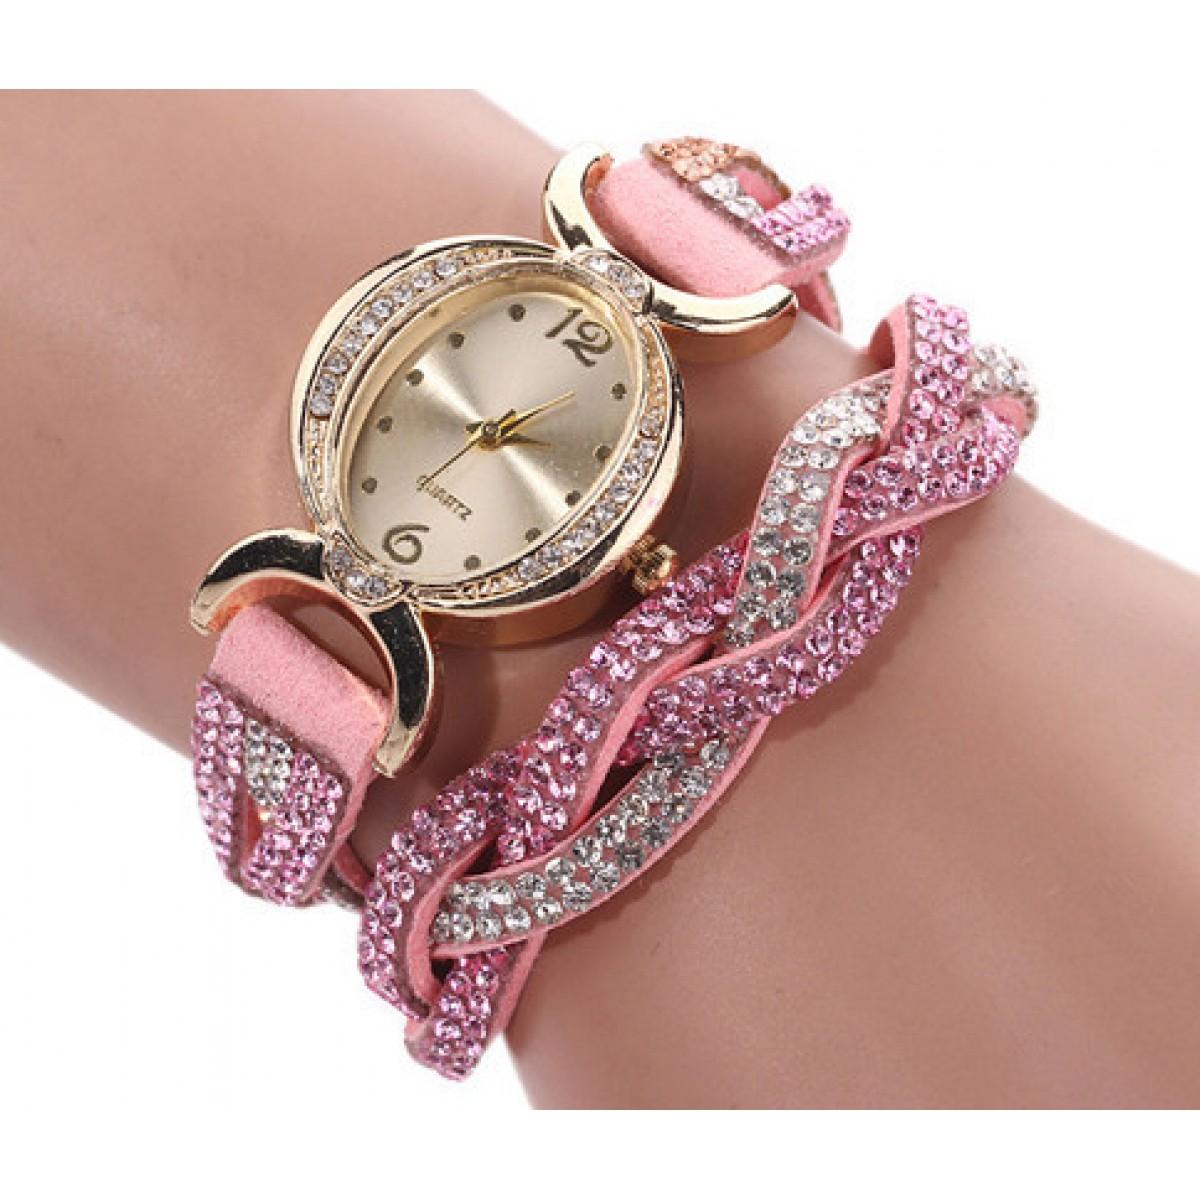 Rhinestone Wrap Watch From Category Watches Trendi